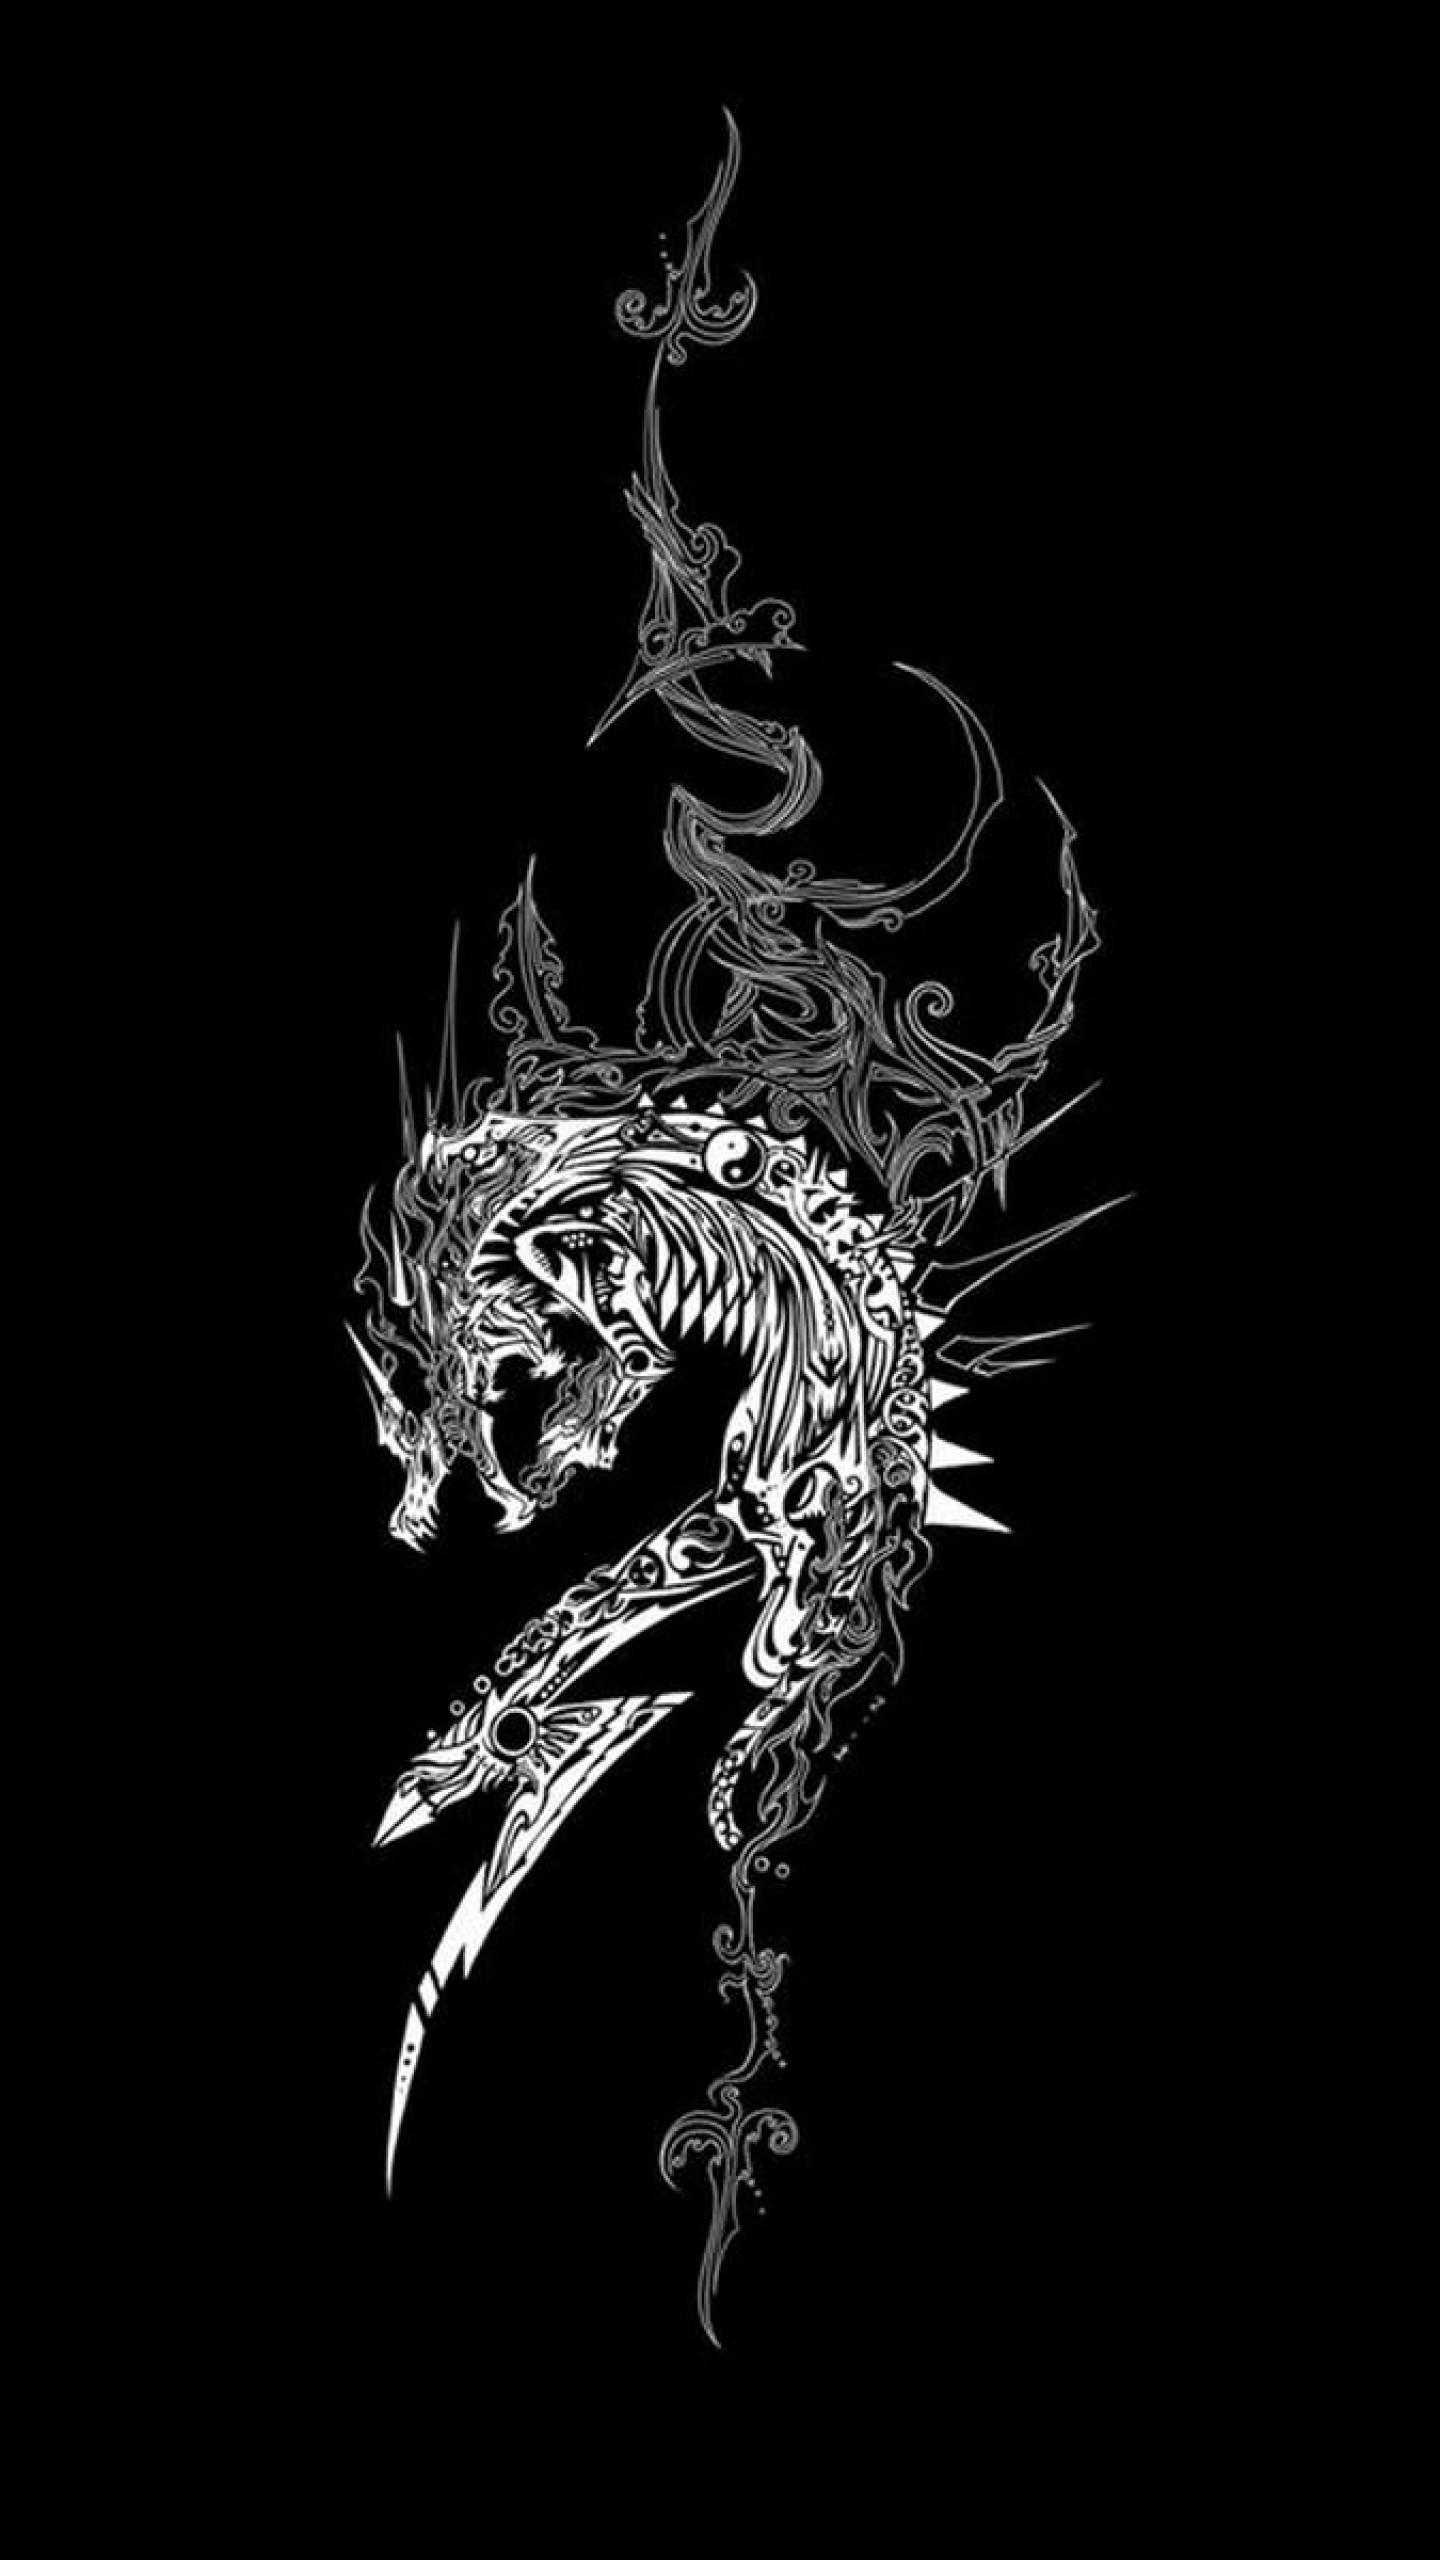 Preview wallpaper dragon, dark background, patterns 1440×2560